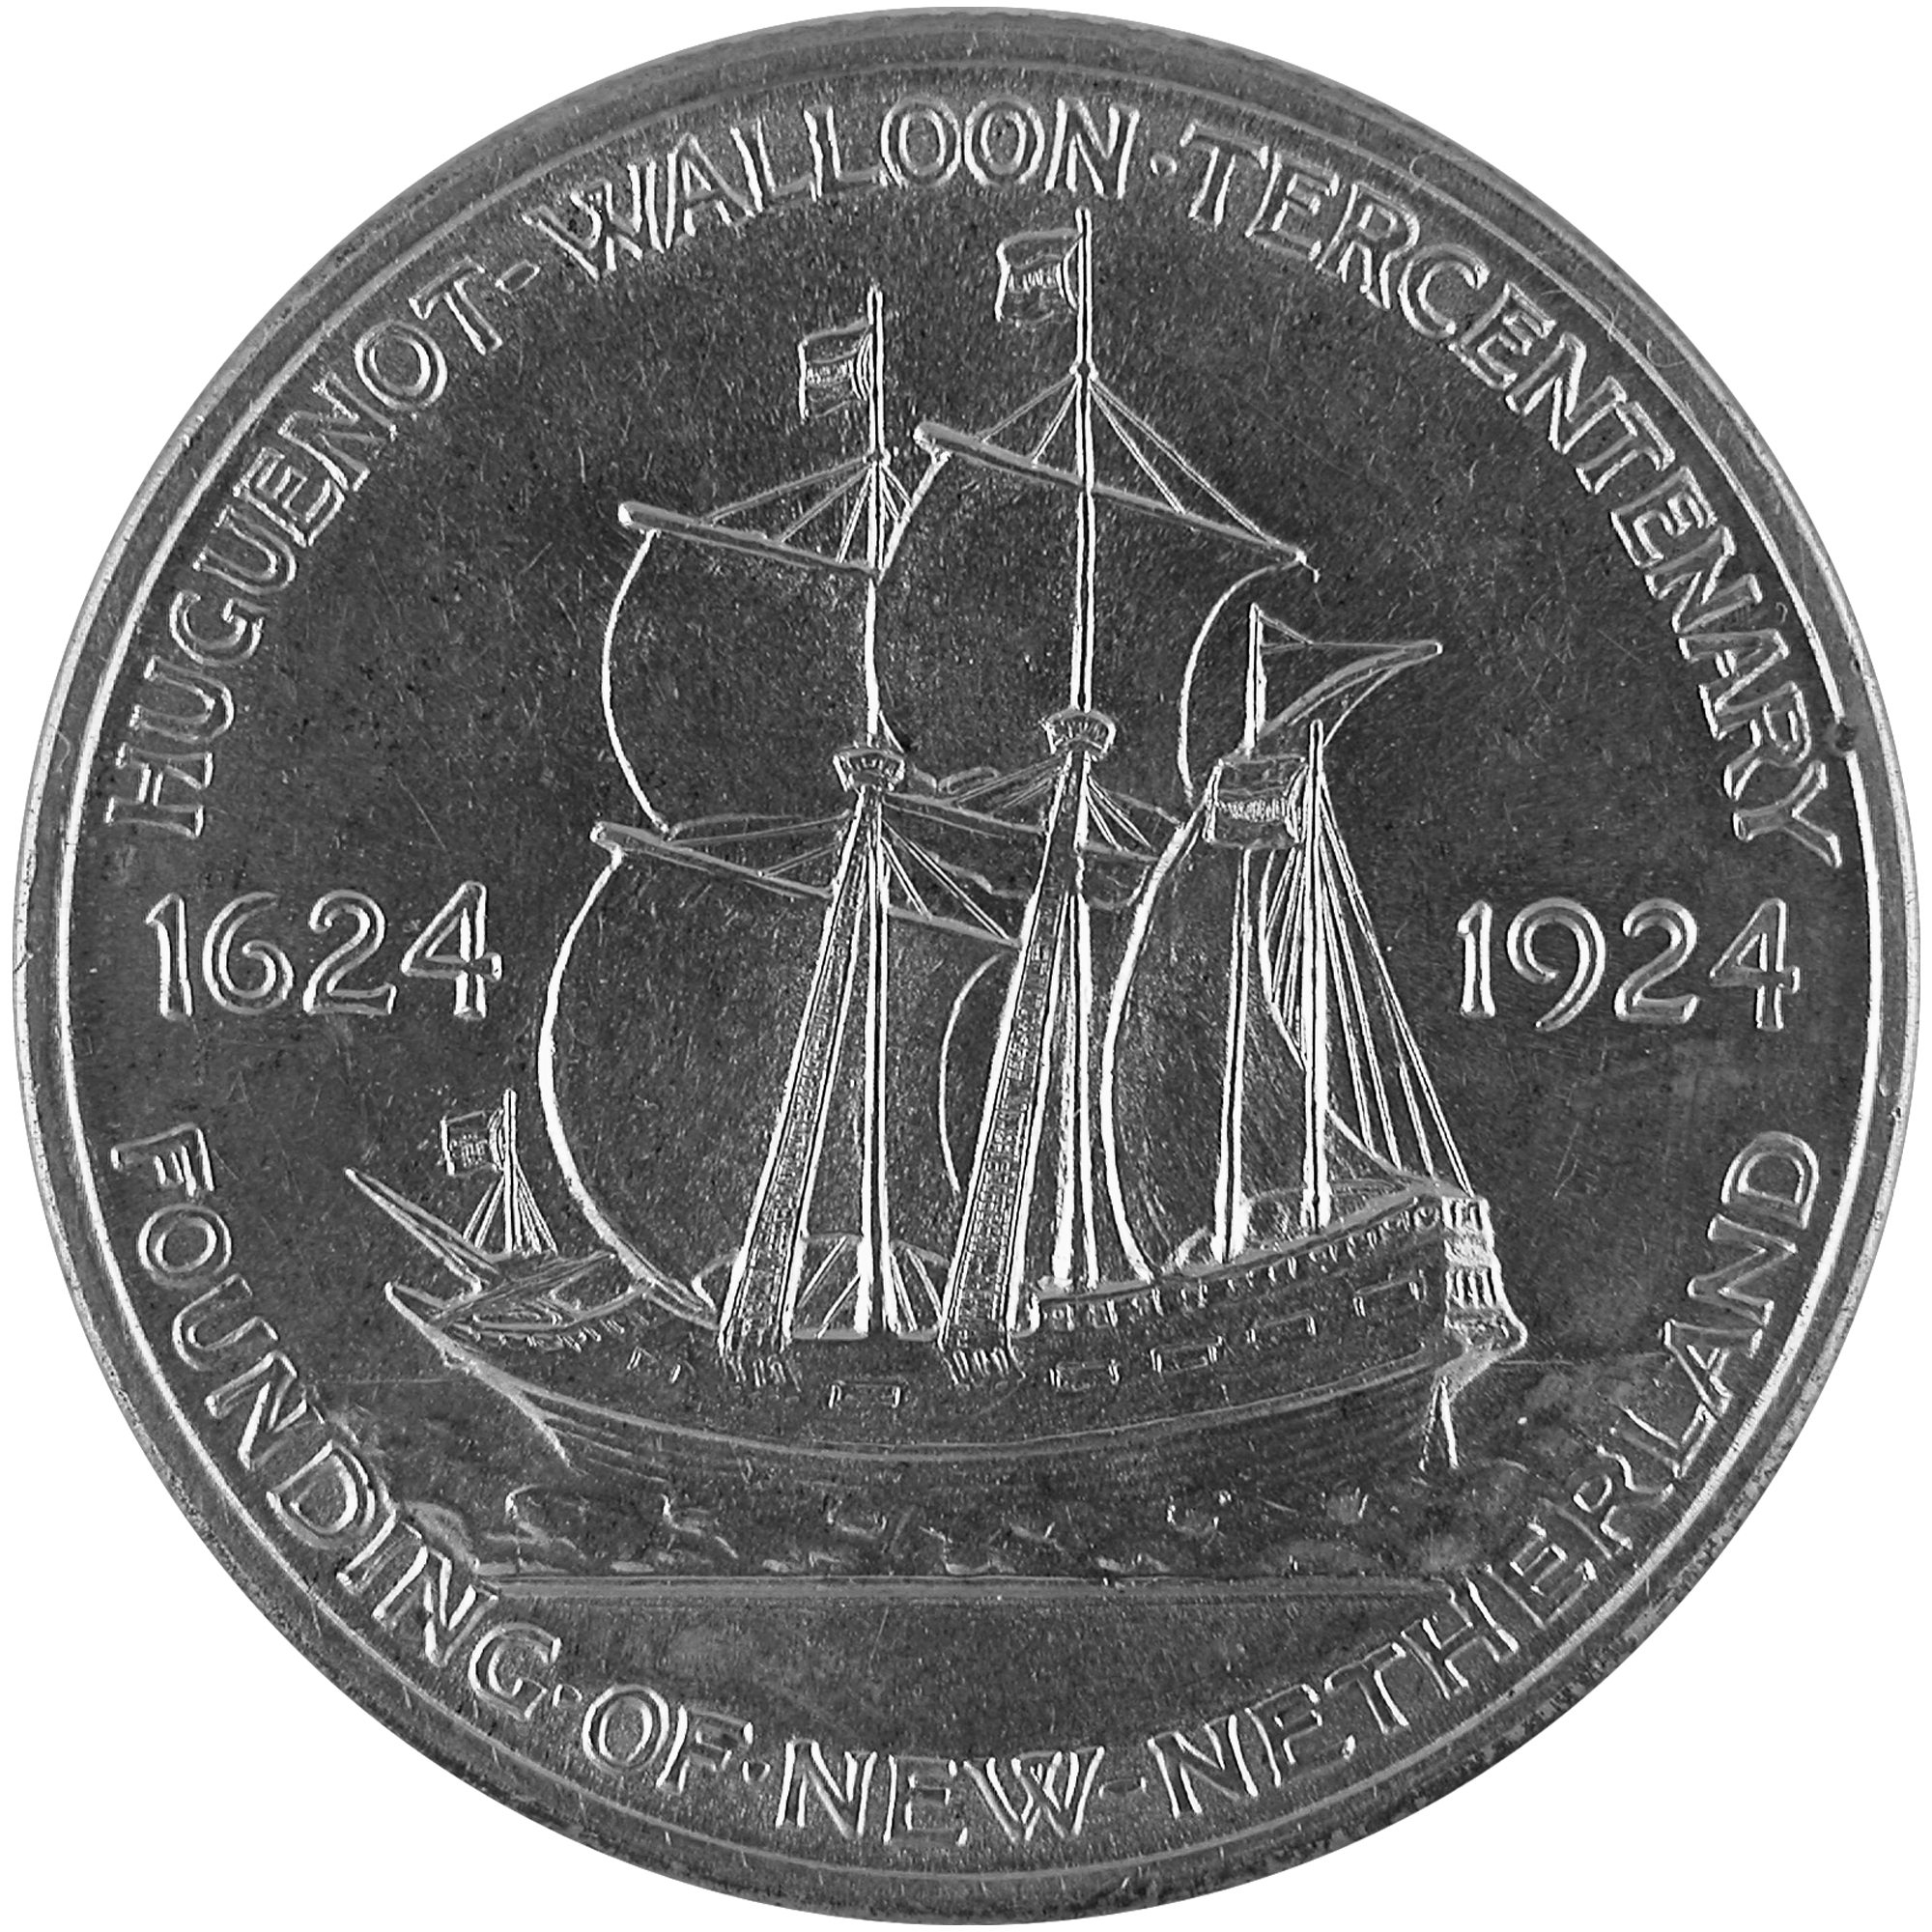 1924 Huguenot Walloon Tercentenary Commemorative Silver Half Dollar Coin Reverse